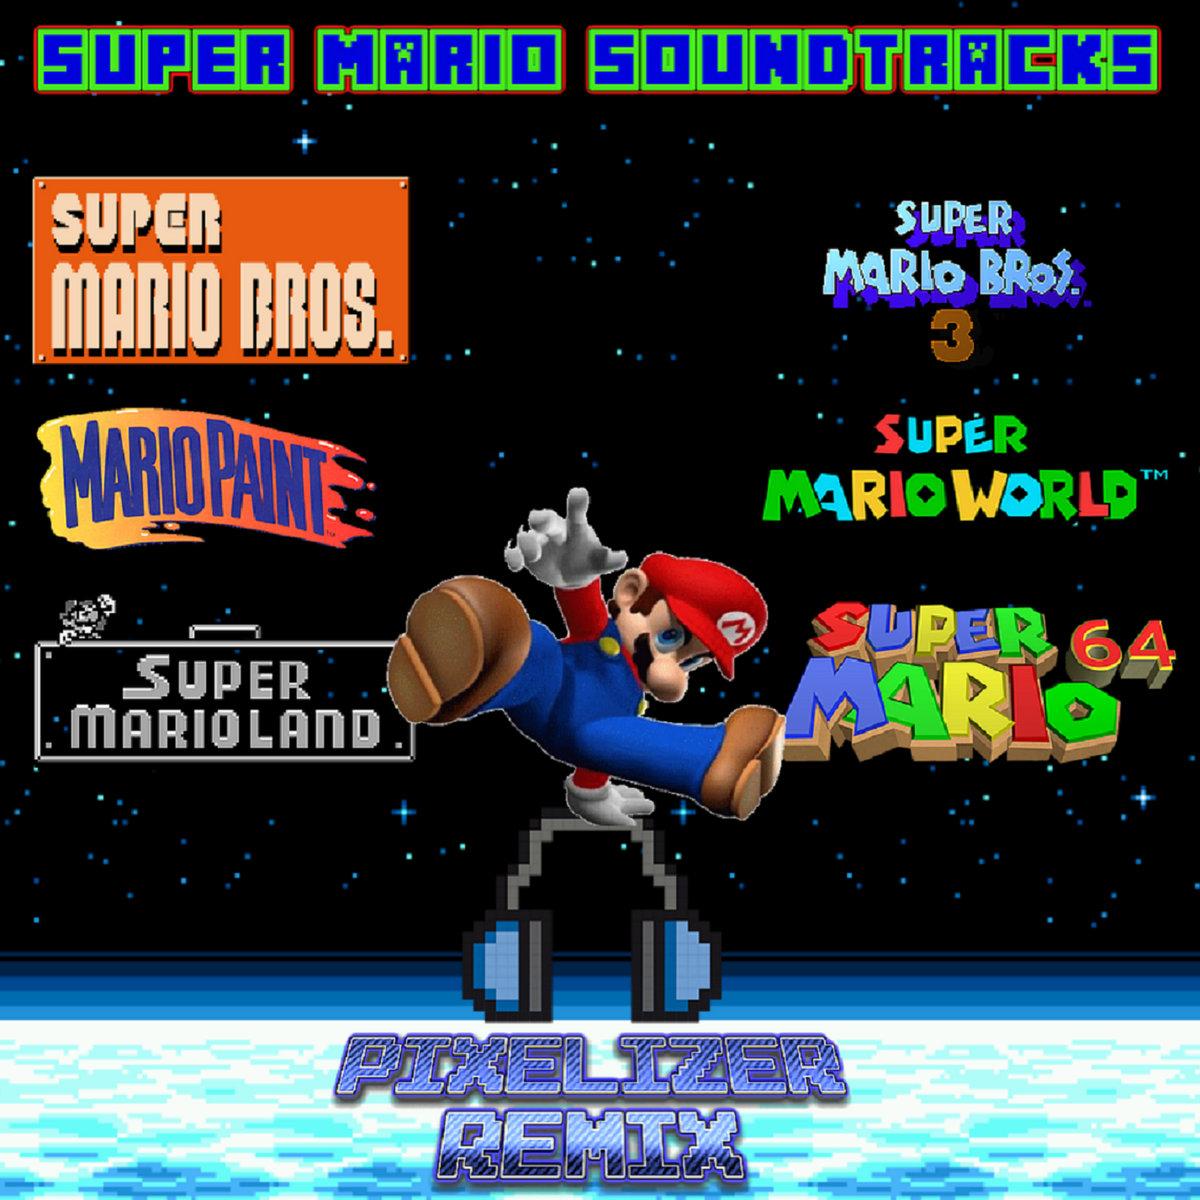 Super Mario Bros - Castle - PIXELIZER REMIX | Pixelizer